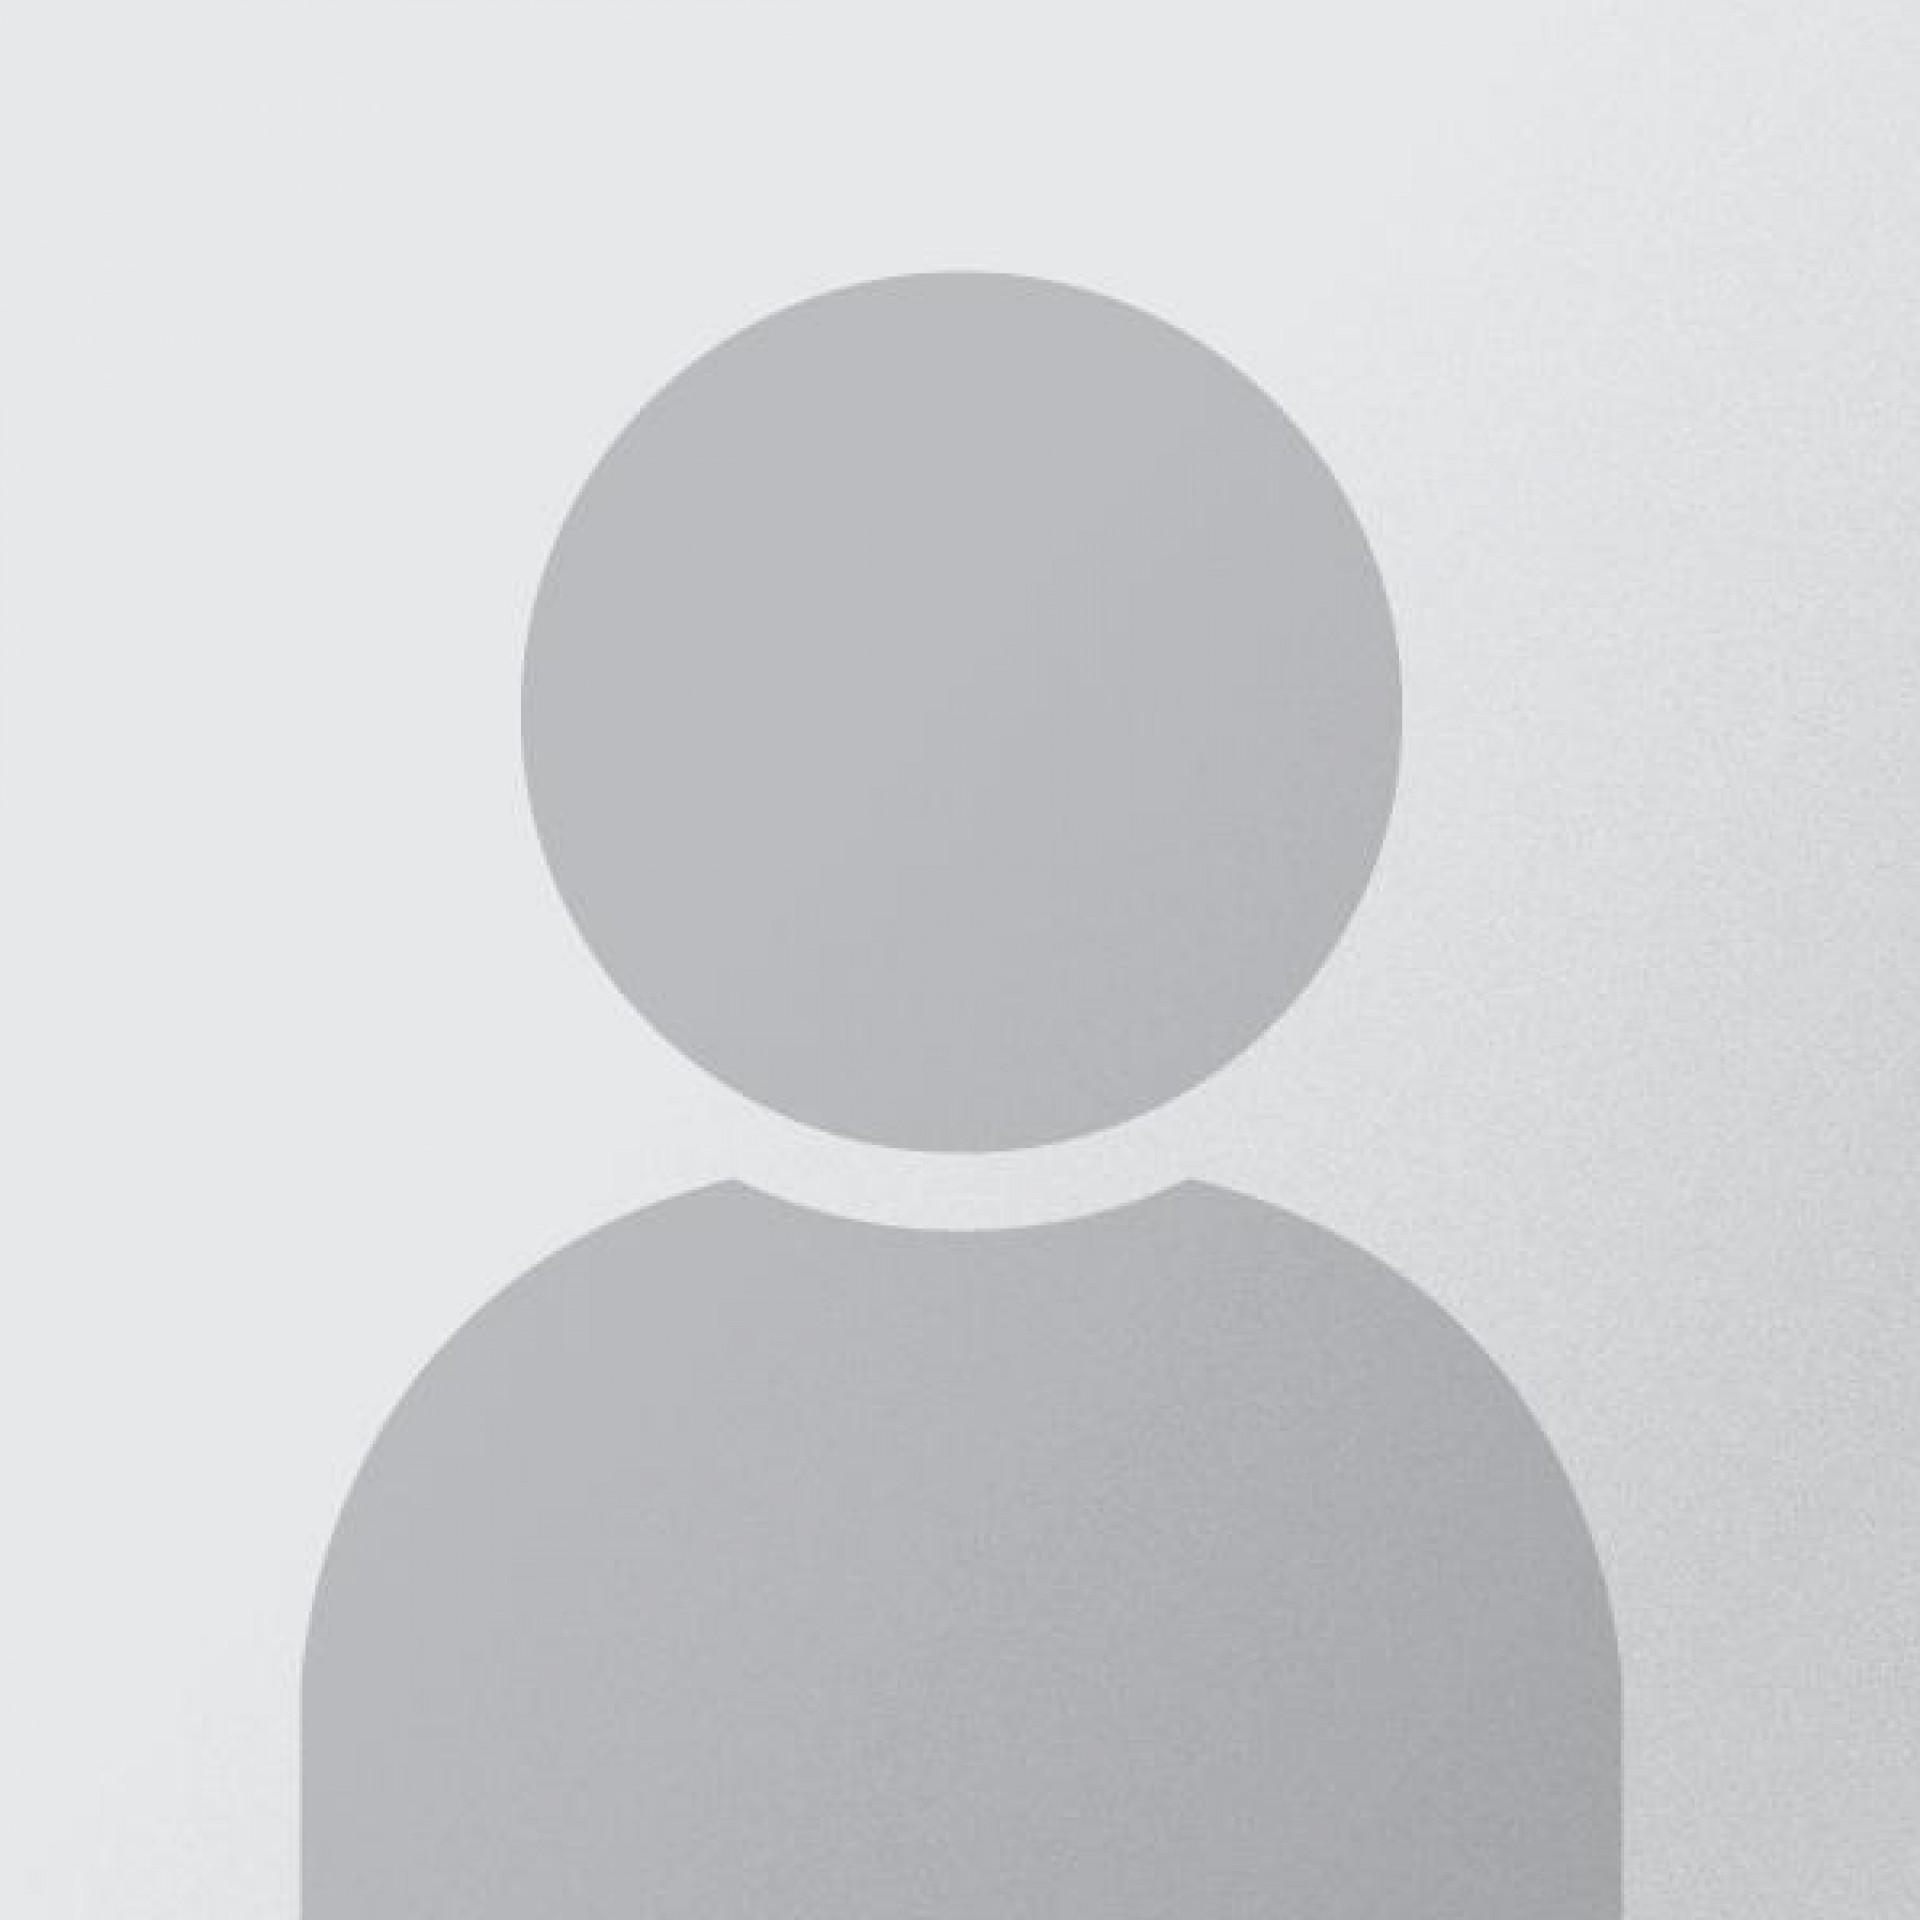 fotografia p021 profilu 0102IW7UX5